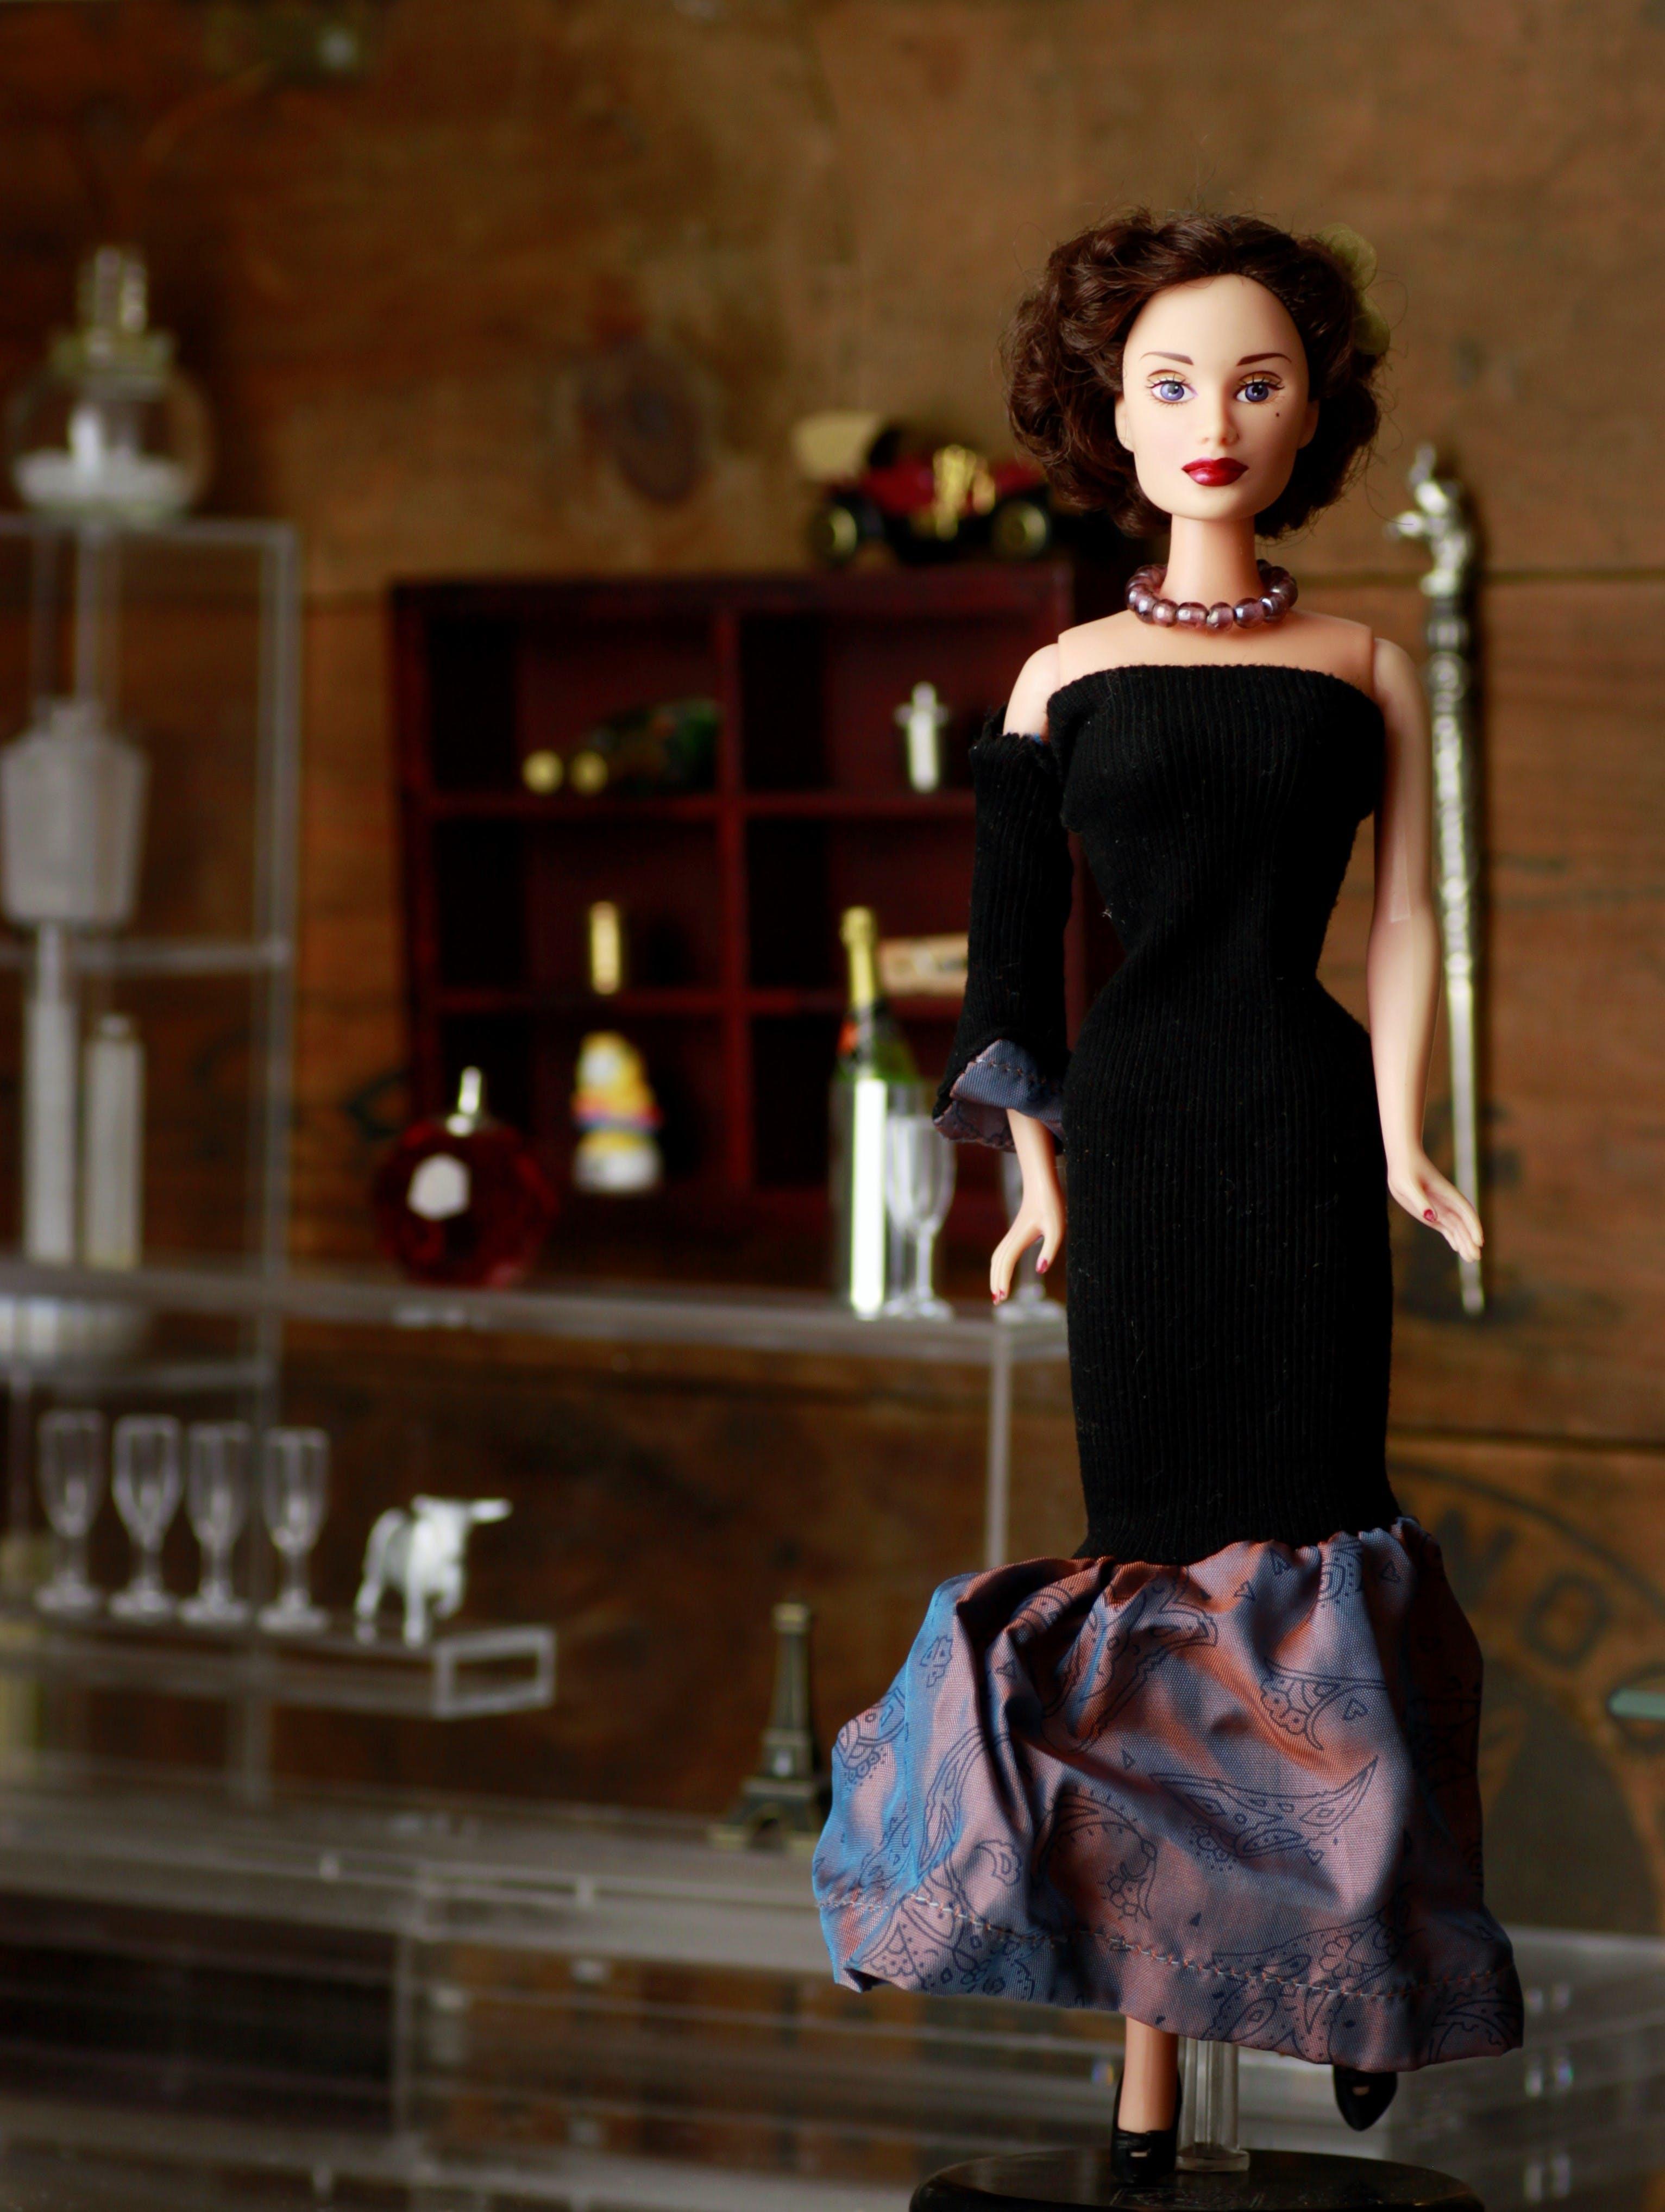 Black Dressed Doll